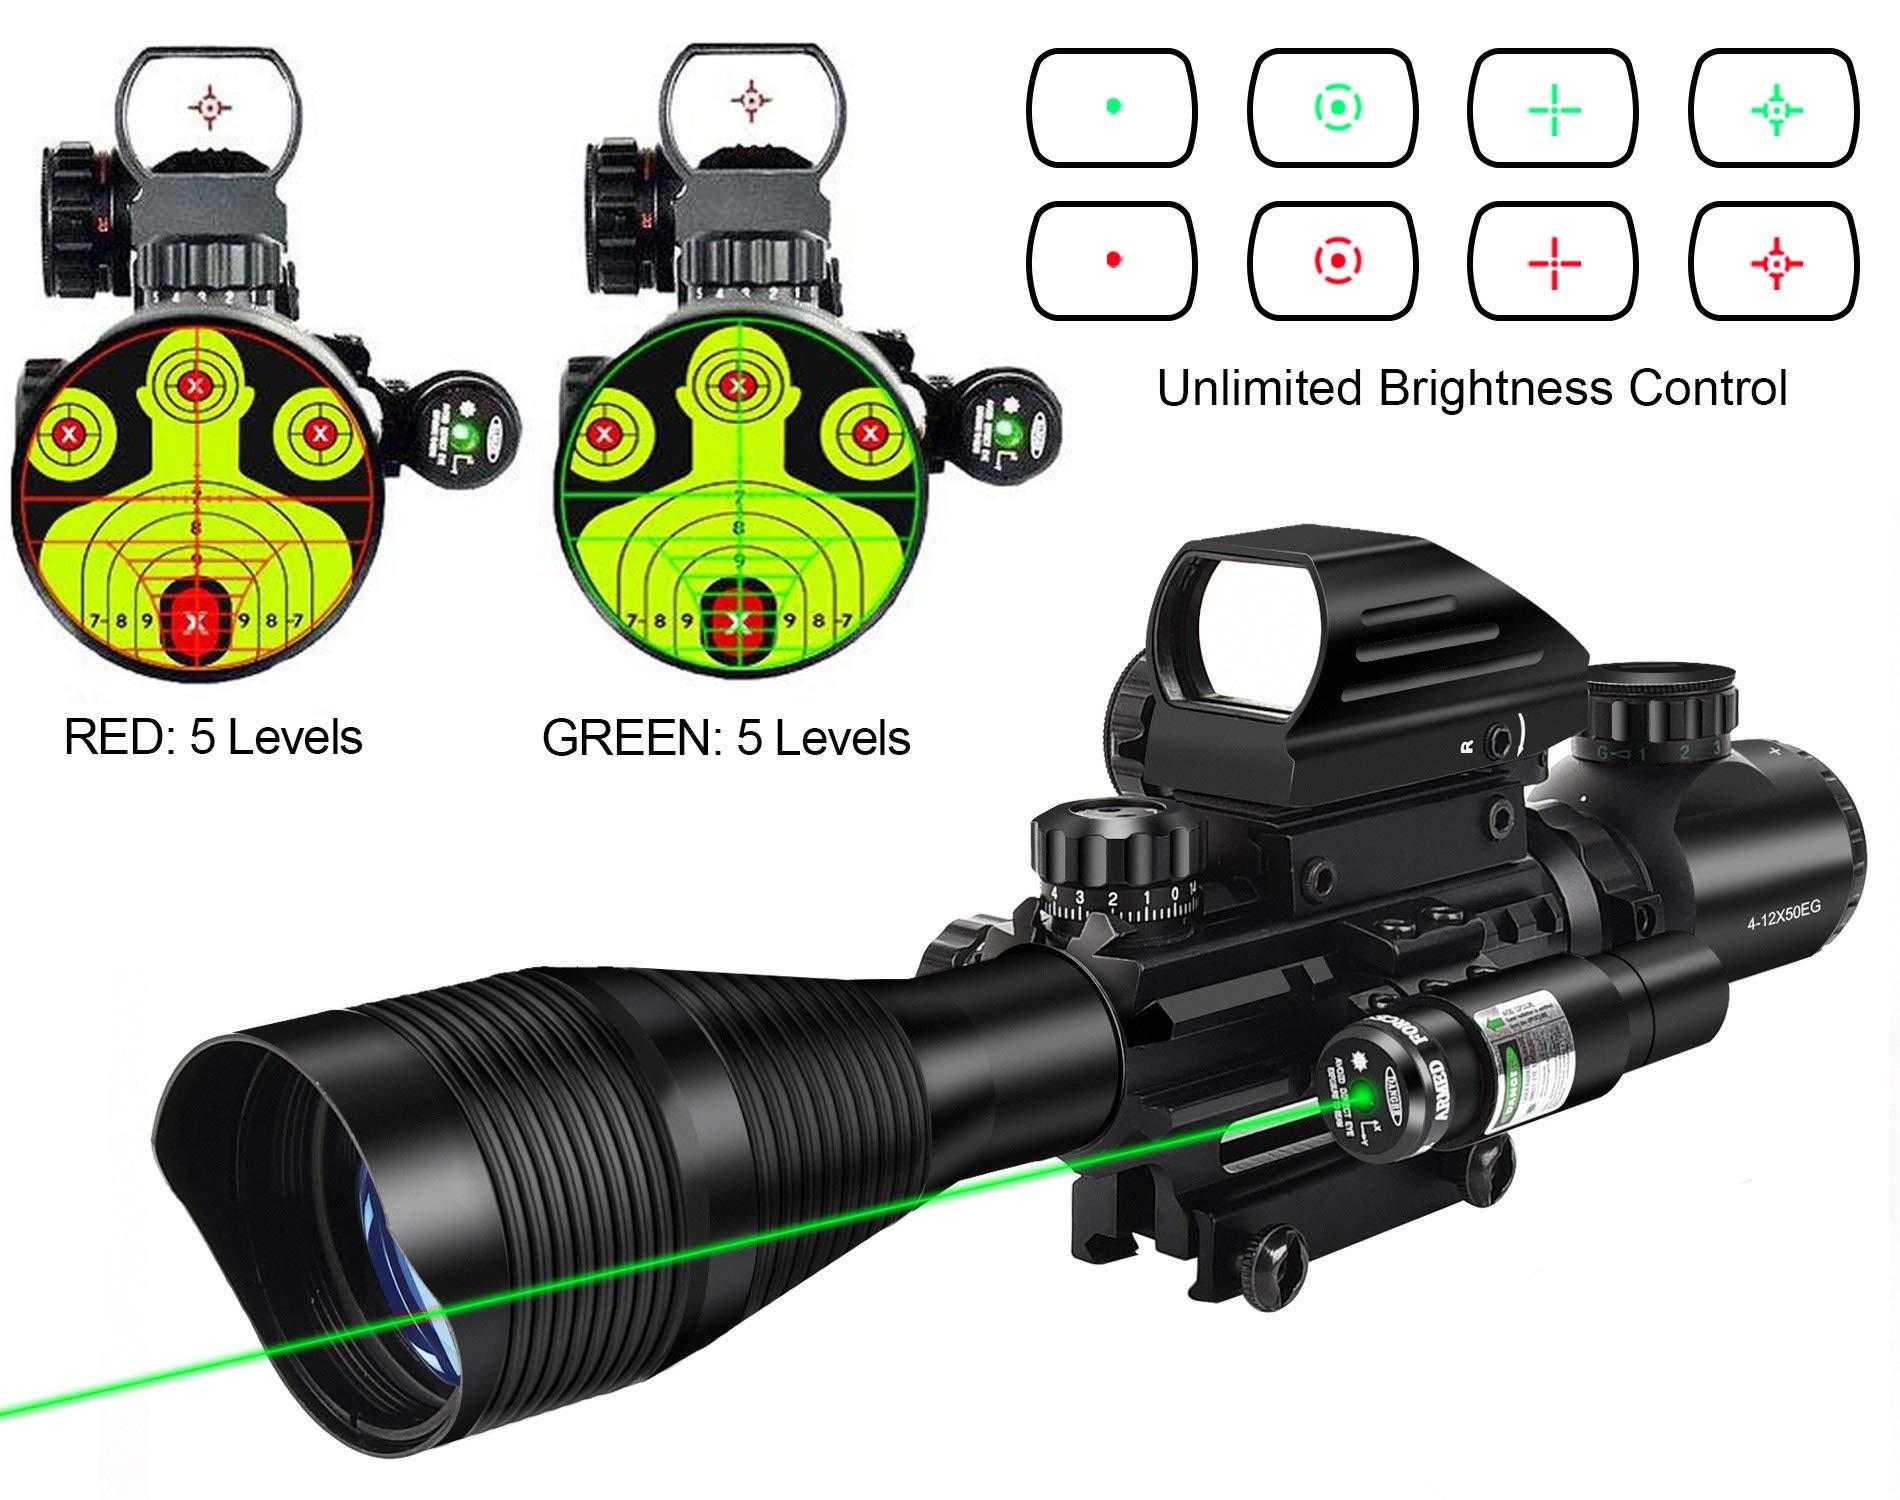 MidTen Riflescope Combo 4-12x50EG Dual Illuminated Optics & IIIA/2MW Laser Sight(Green) & 4 Holographic Reticle Red/Green Dot Sight & 20mm Scope Mount by MidTen